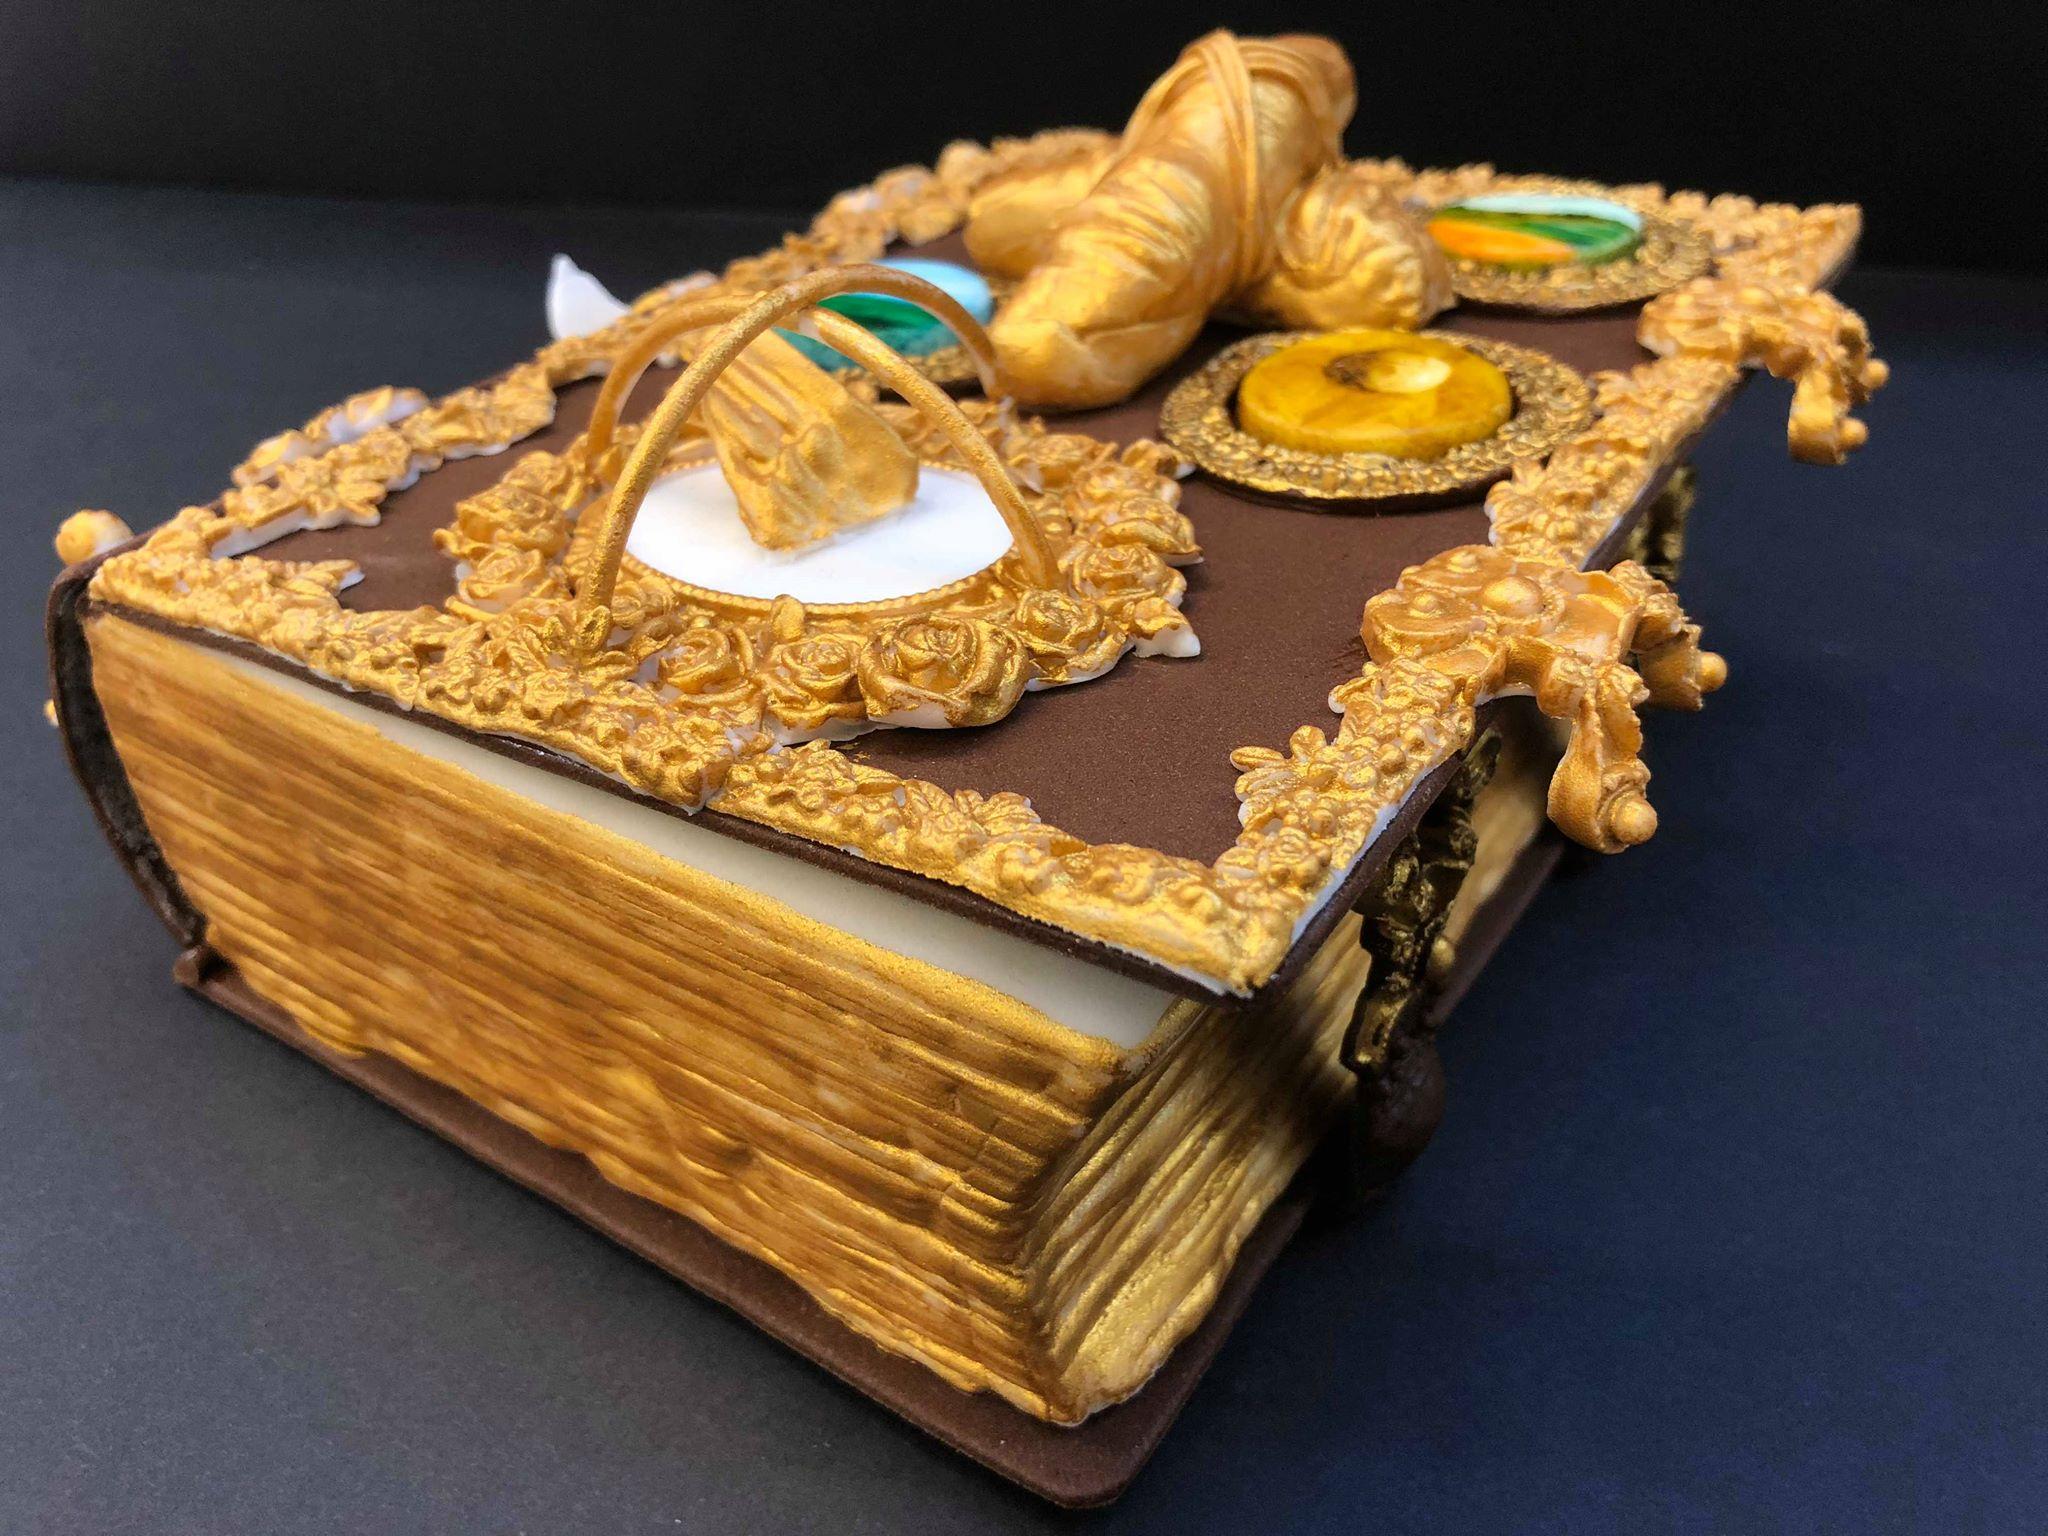 sweet-art-gifts-2910 (38)